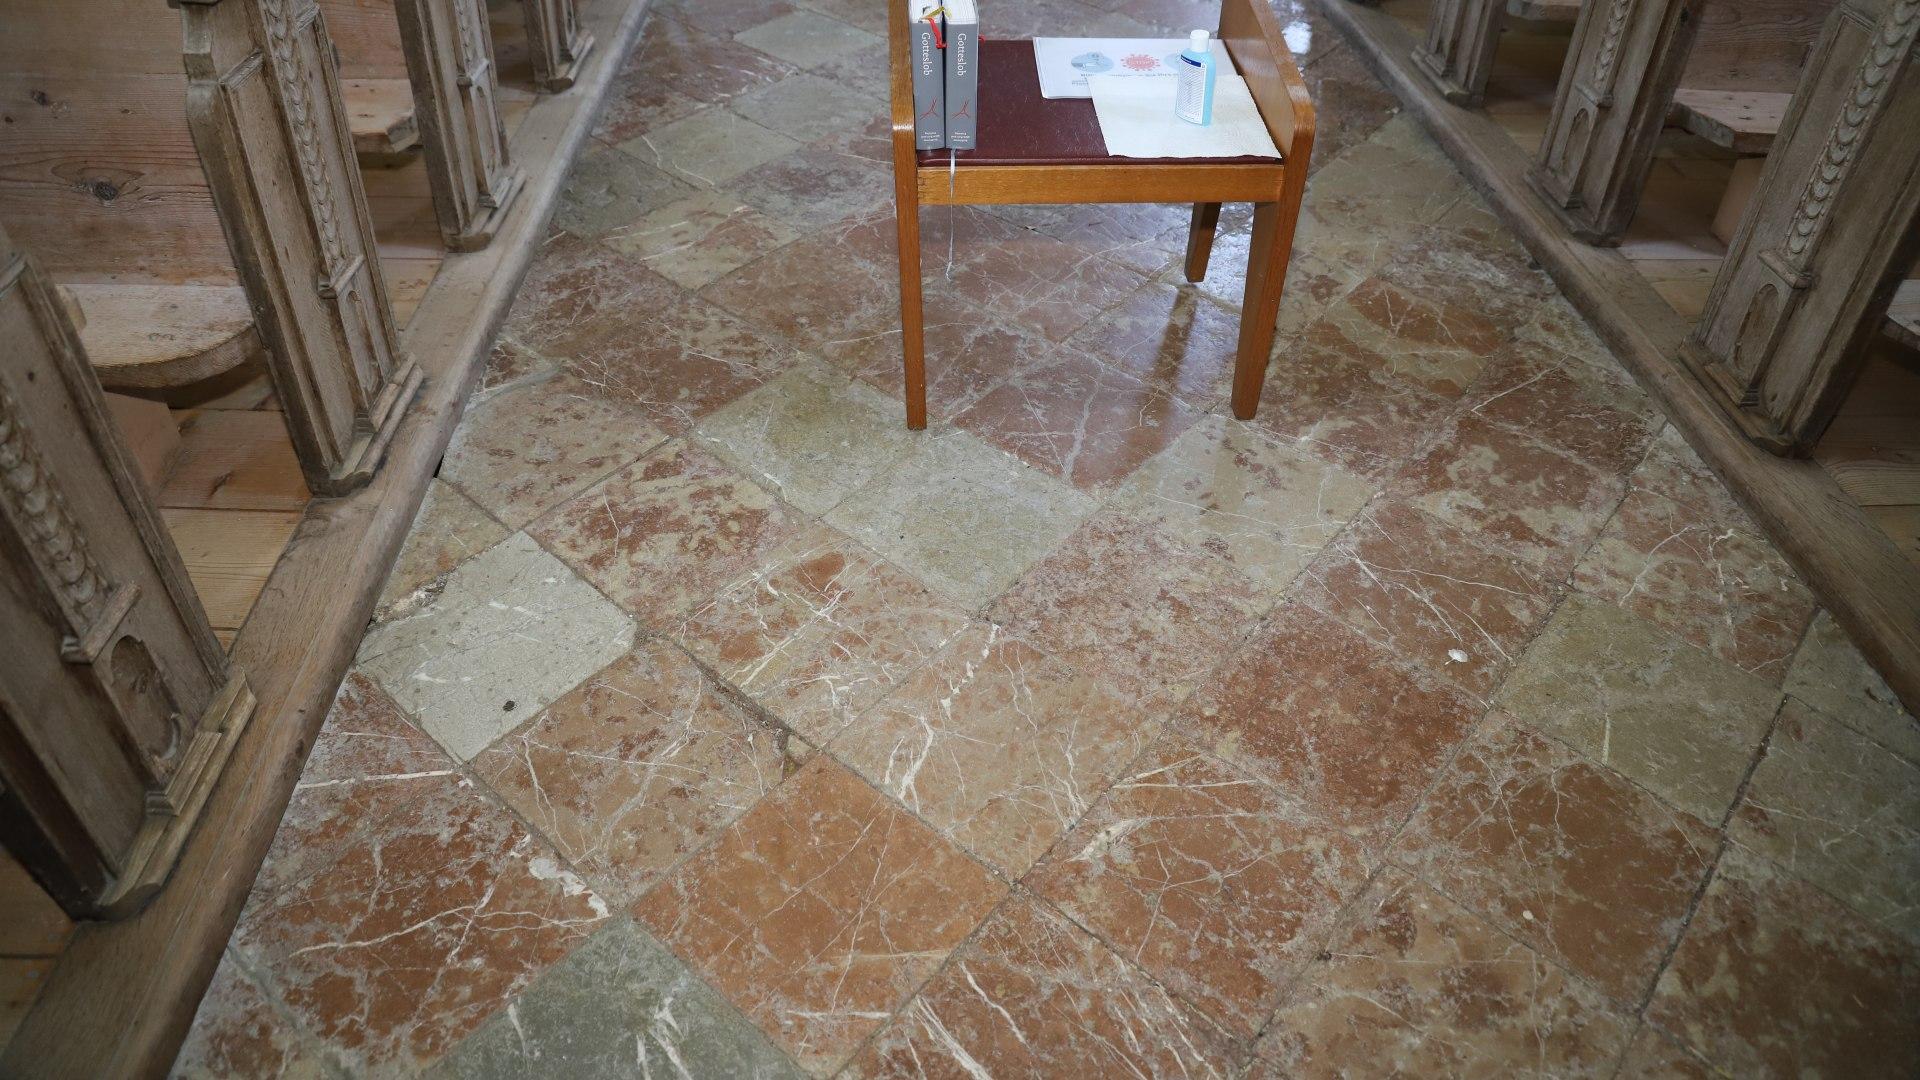 Boden der St. Quirinus Kirche Tegernsee, © Hartmut Wolf